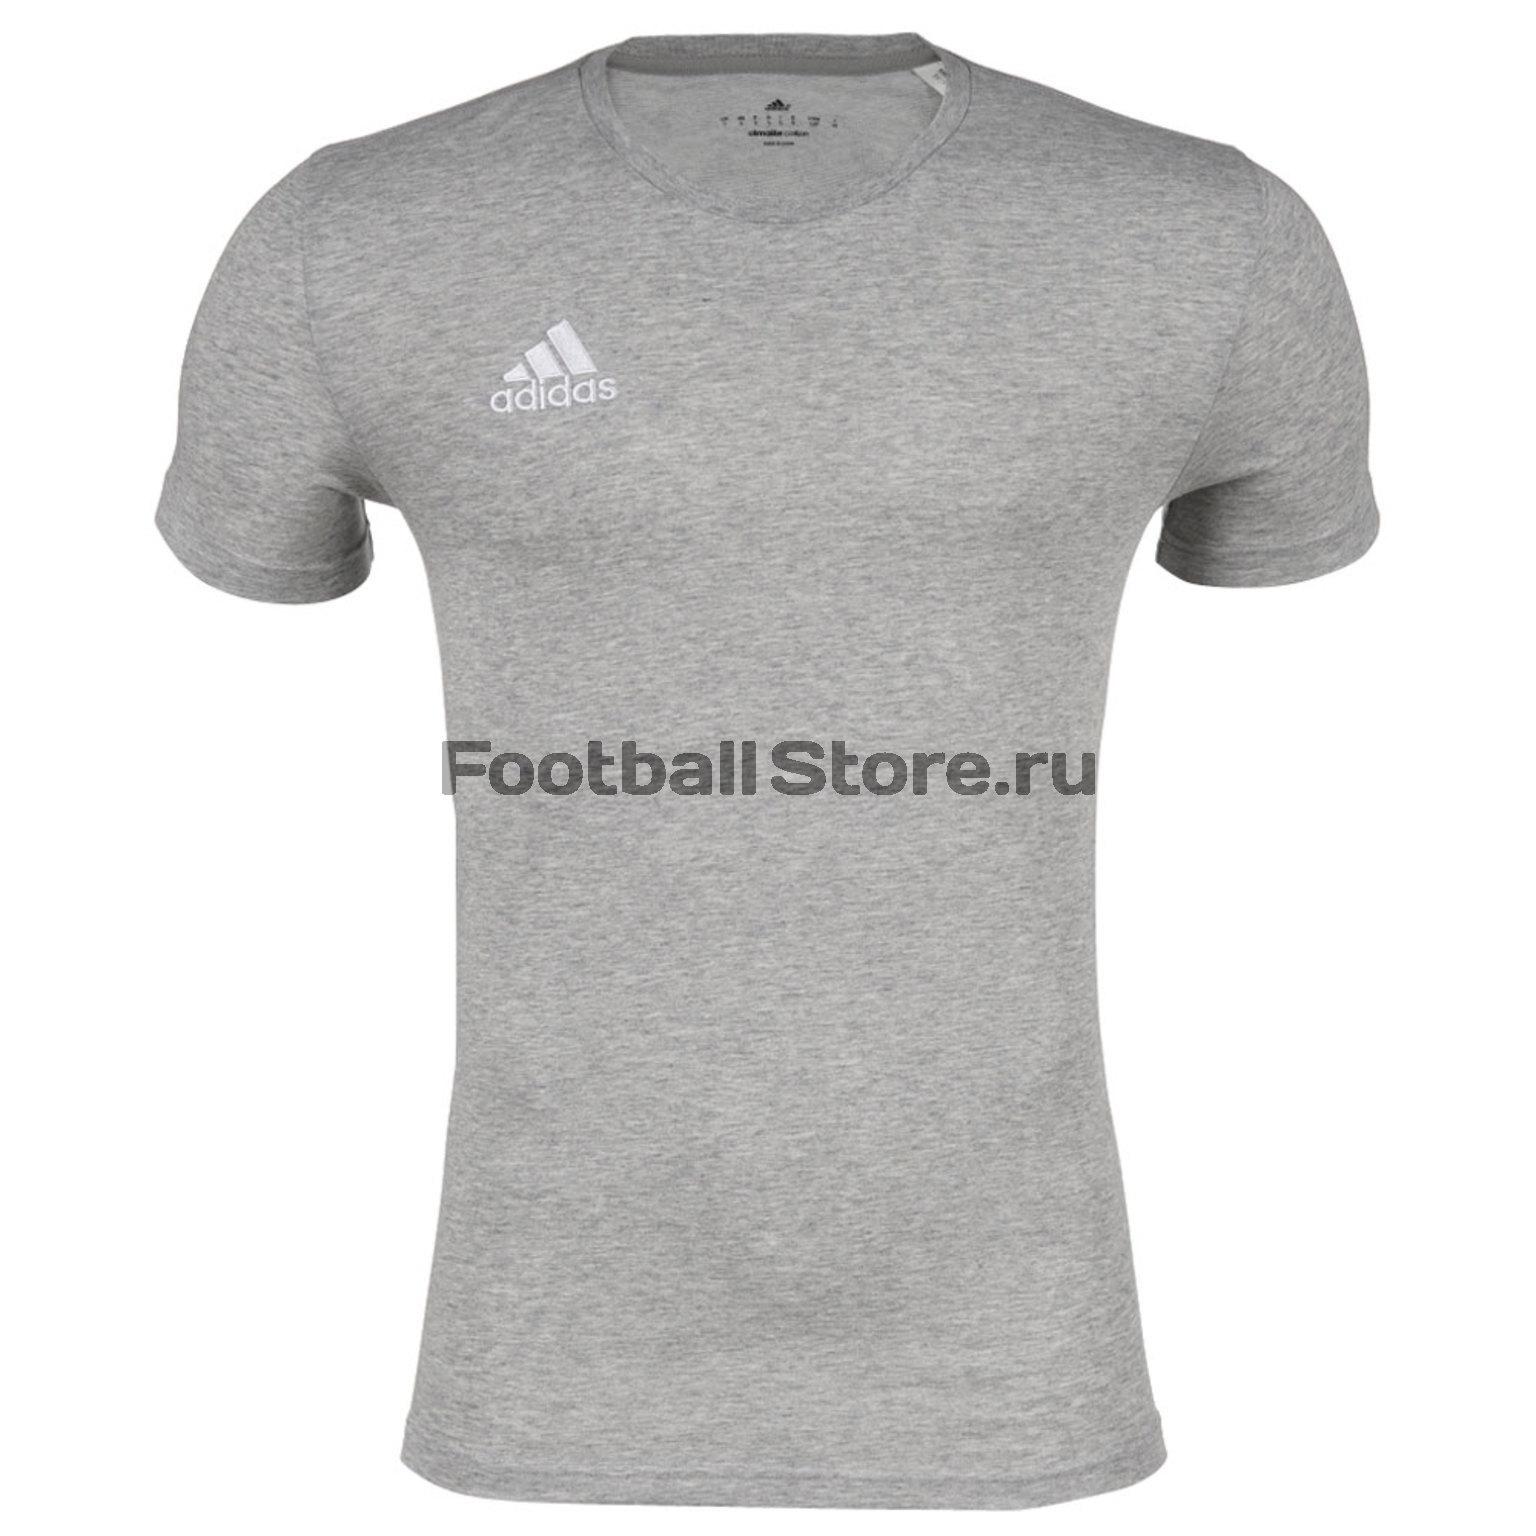 Футболки Adidas Футболка Adidas Coref Tee S22386 кордщетка атака 22386